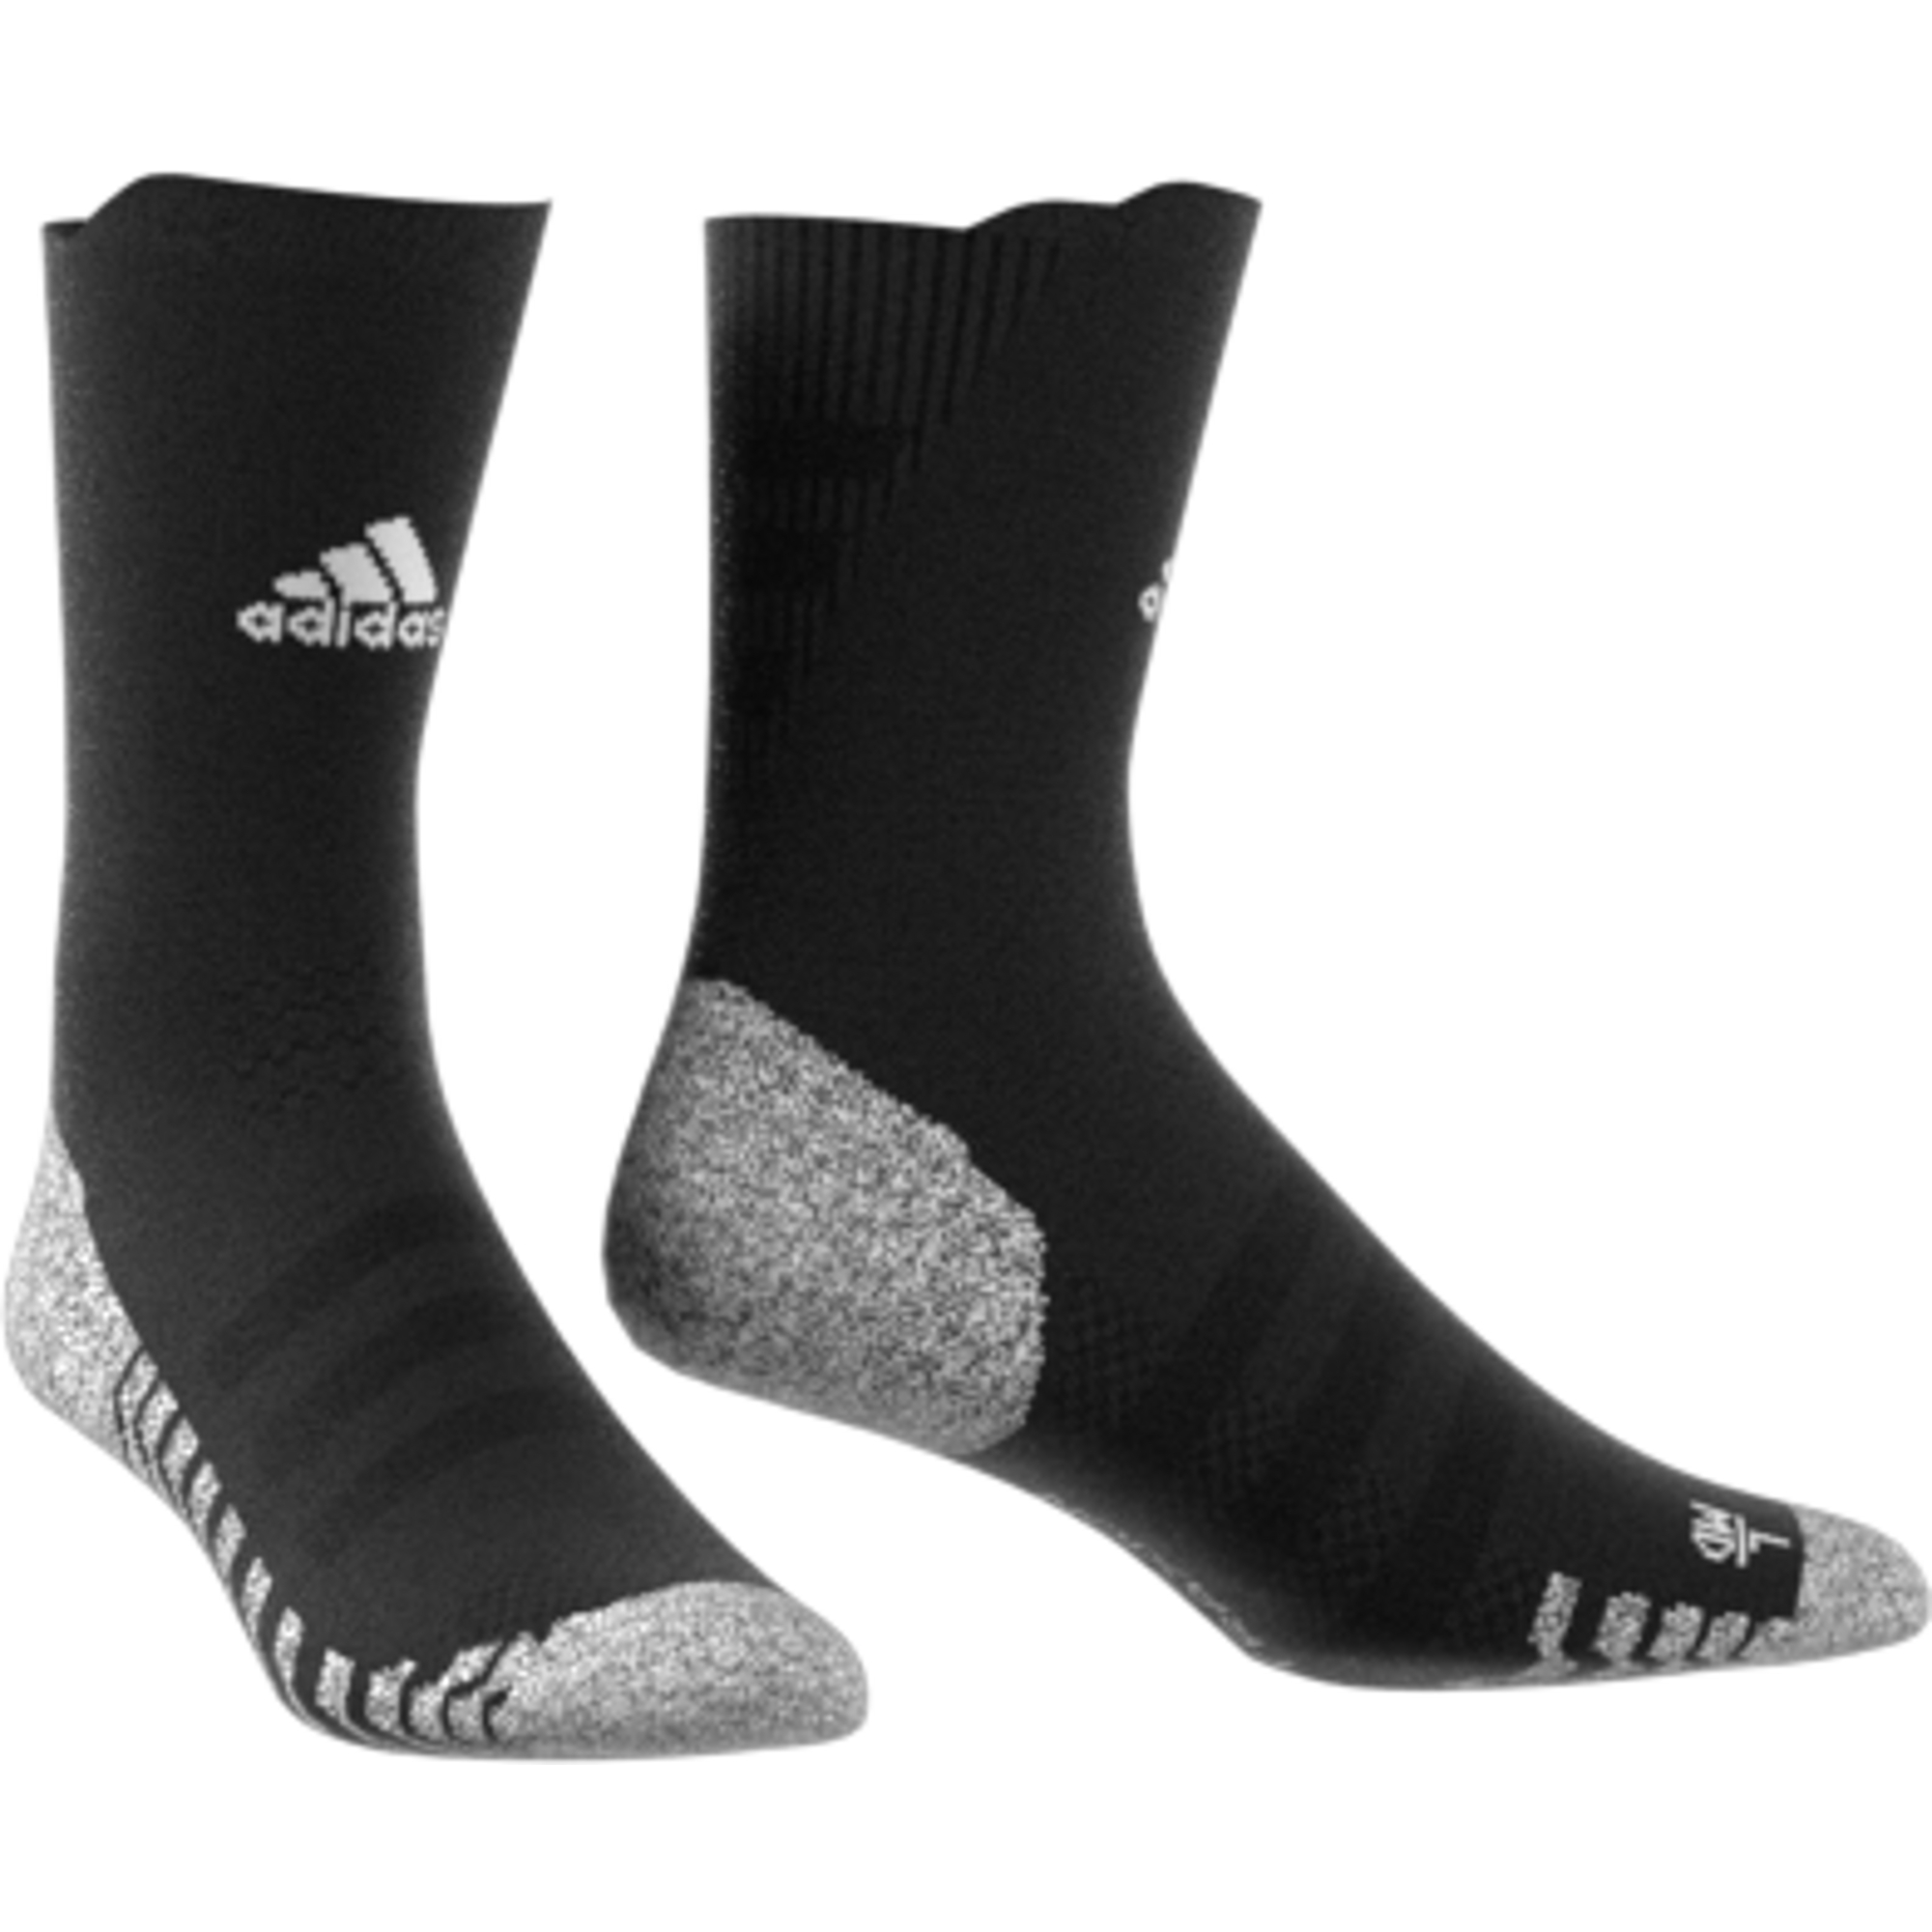 ADIDAS ponožky Low Cushion Traxion  e245a77a8f